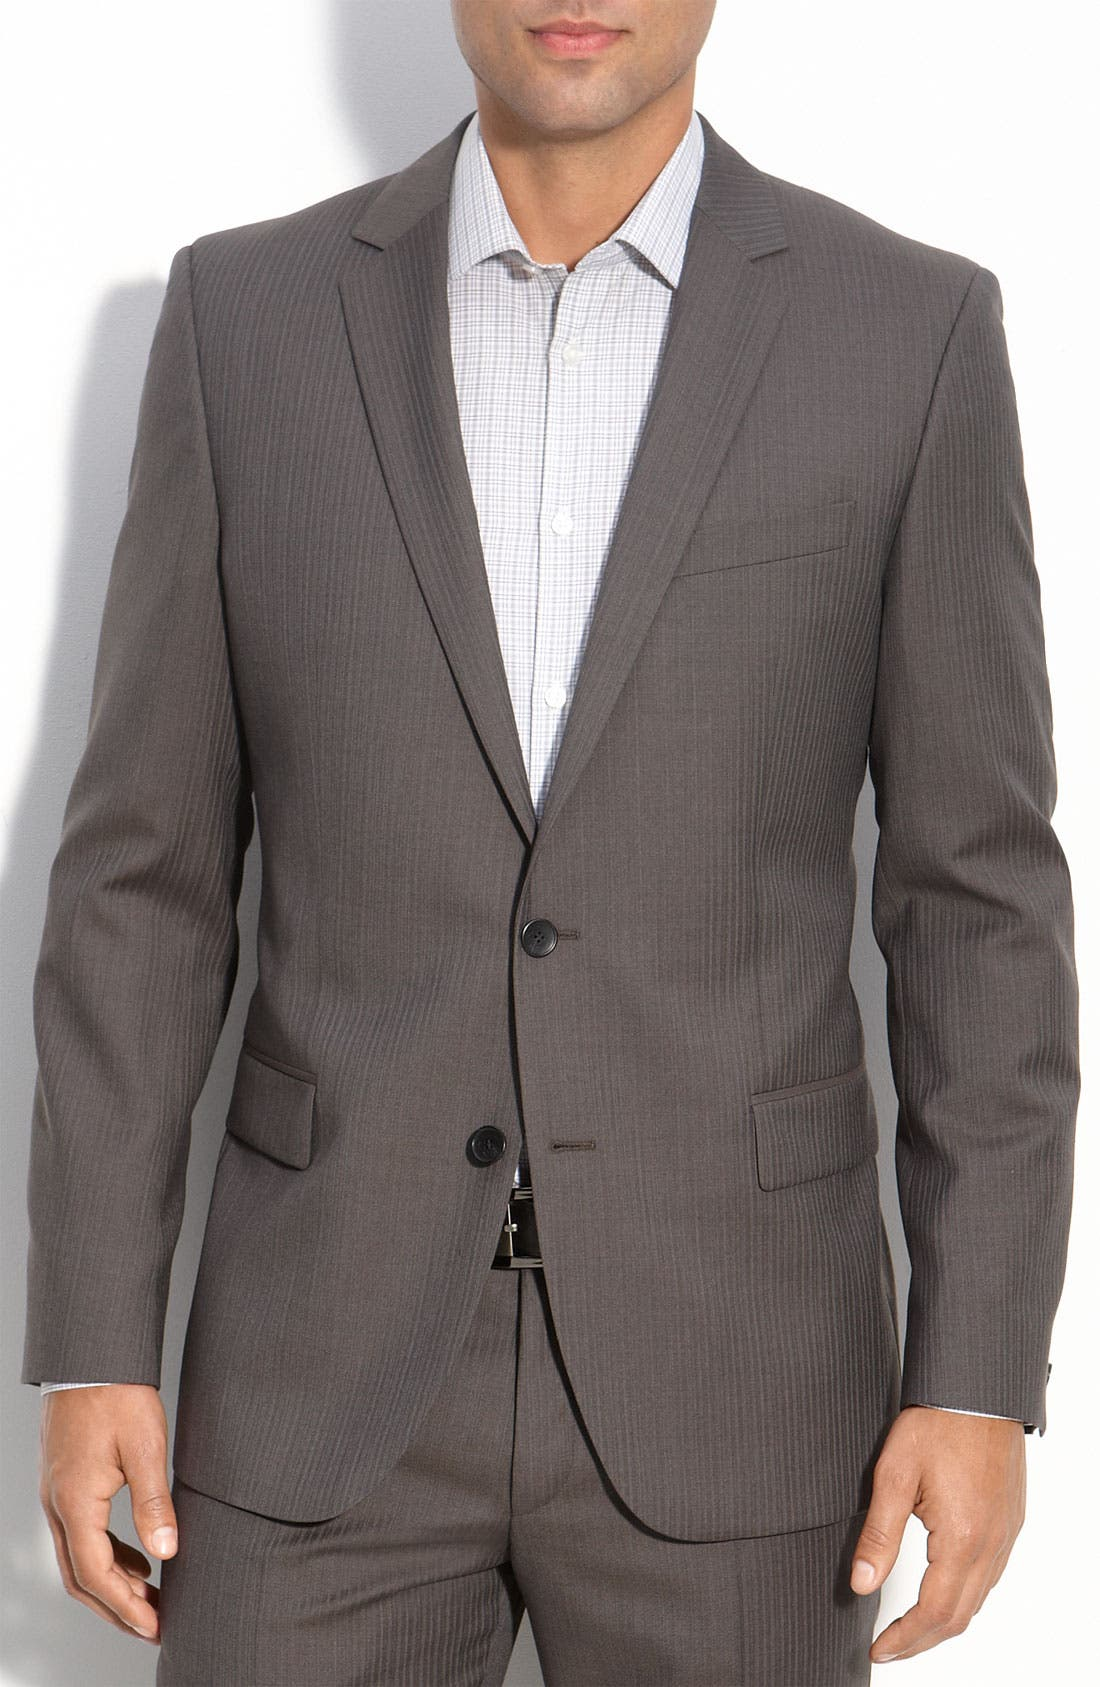 ZZDNUHUGO BOSS HUGO 'Amaro/Heise' Grey Shadow Stripe Wool Suit, Main, color, 030